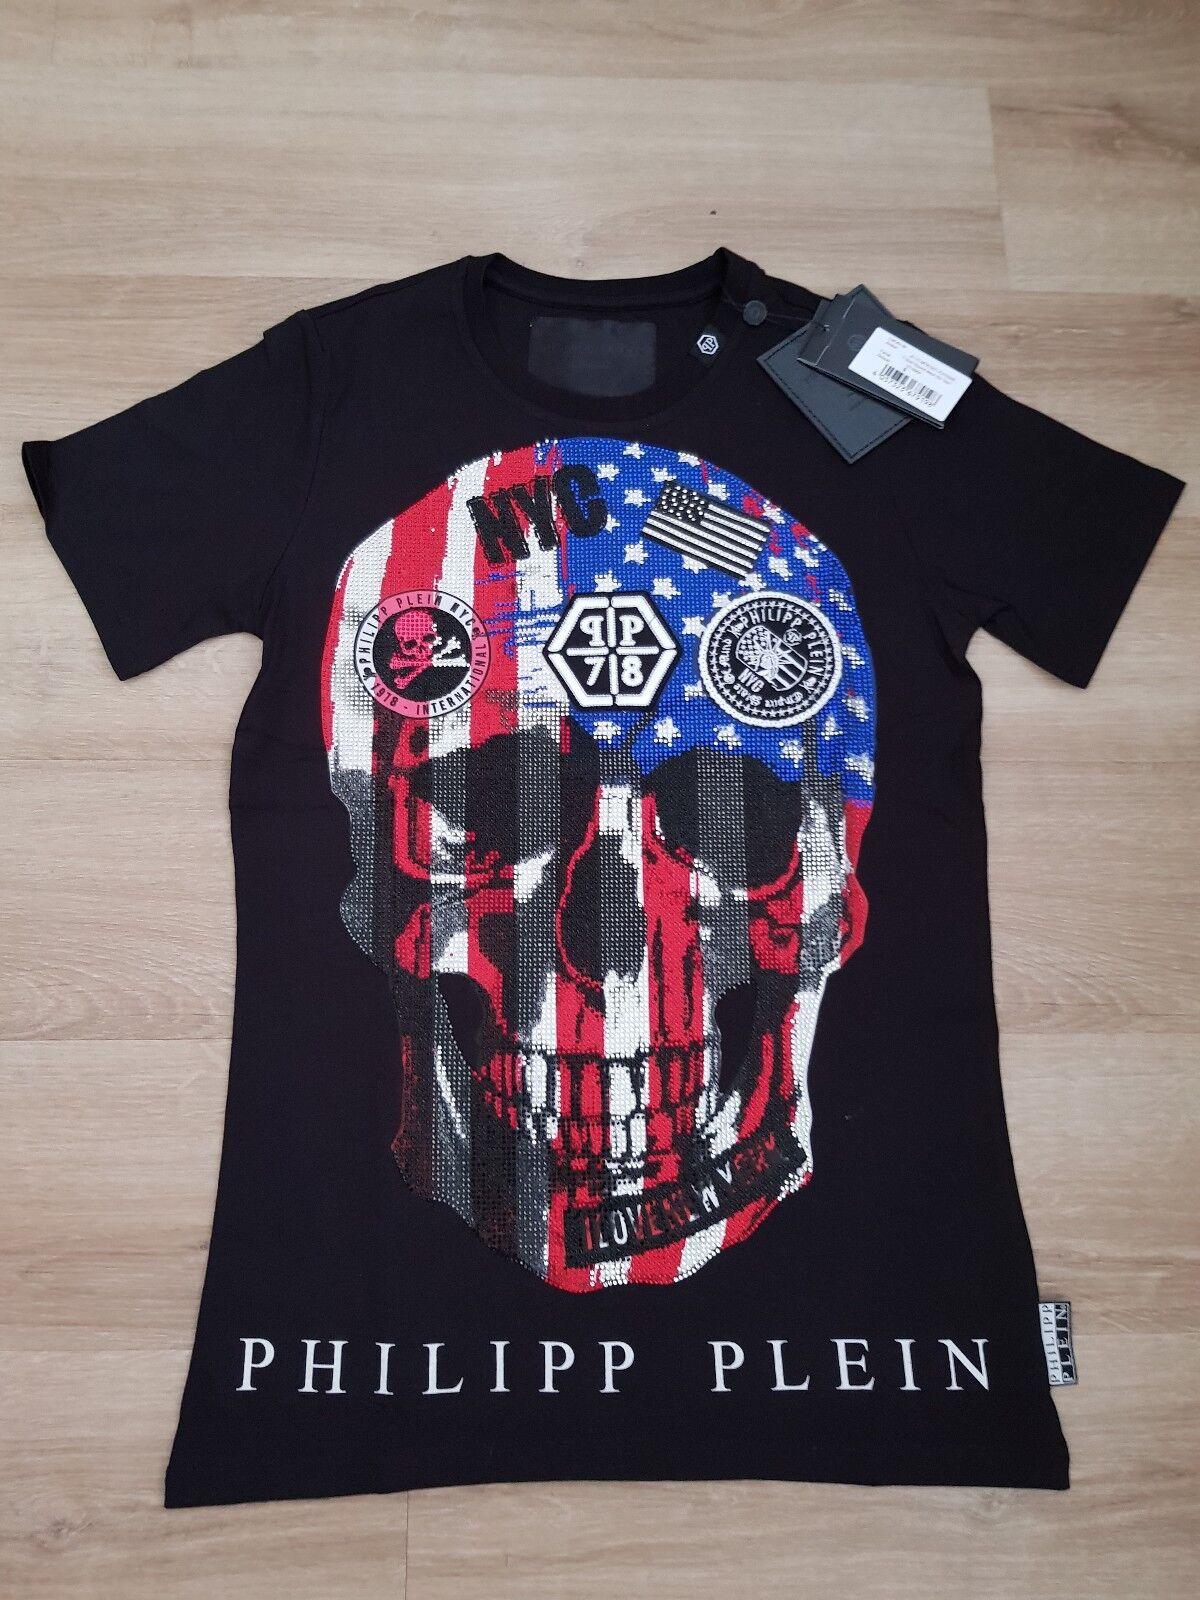 Philipp Plein T-Shirt   Dan   Gr. M M M Neu e07cb9